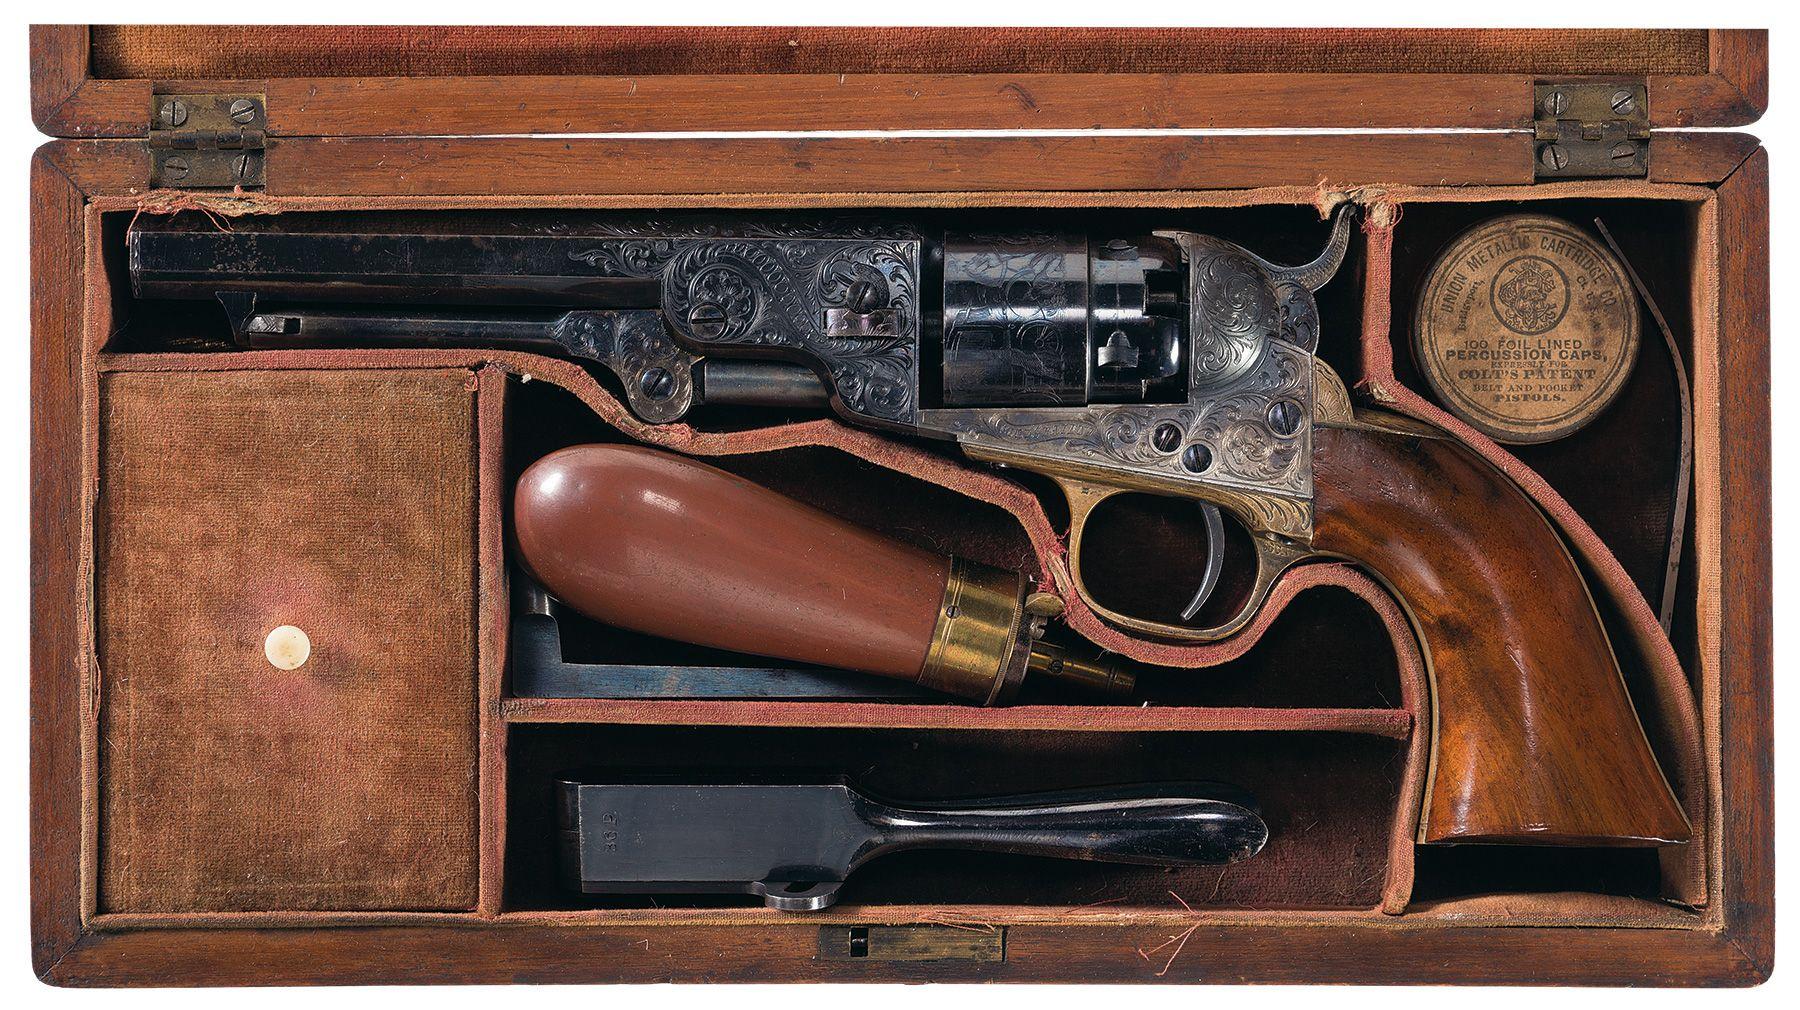 cased factory engraved colt model 1862 pocket navy revolver with